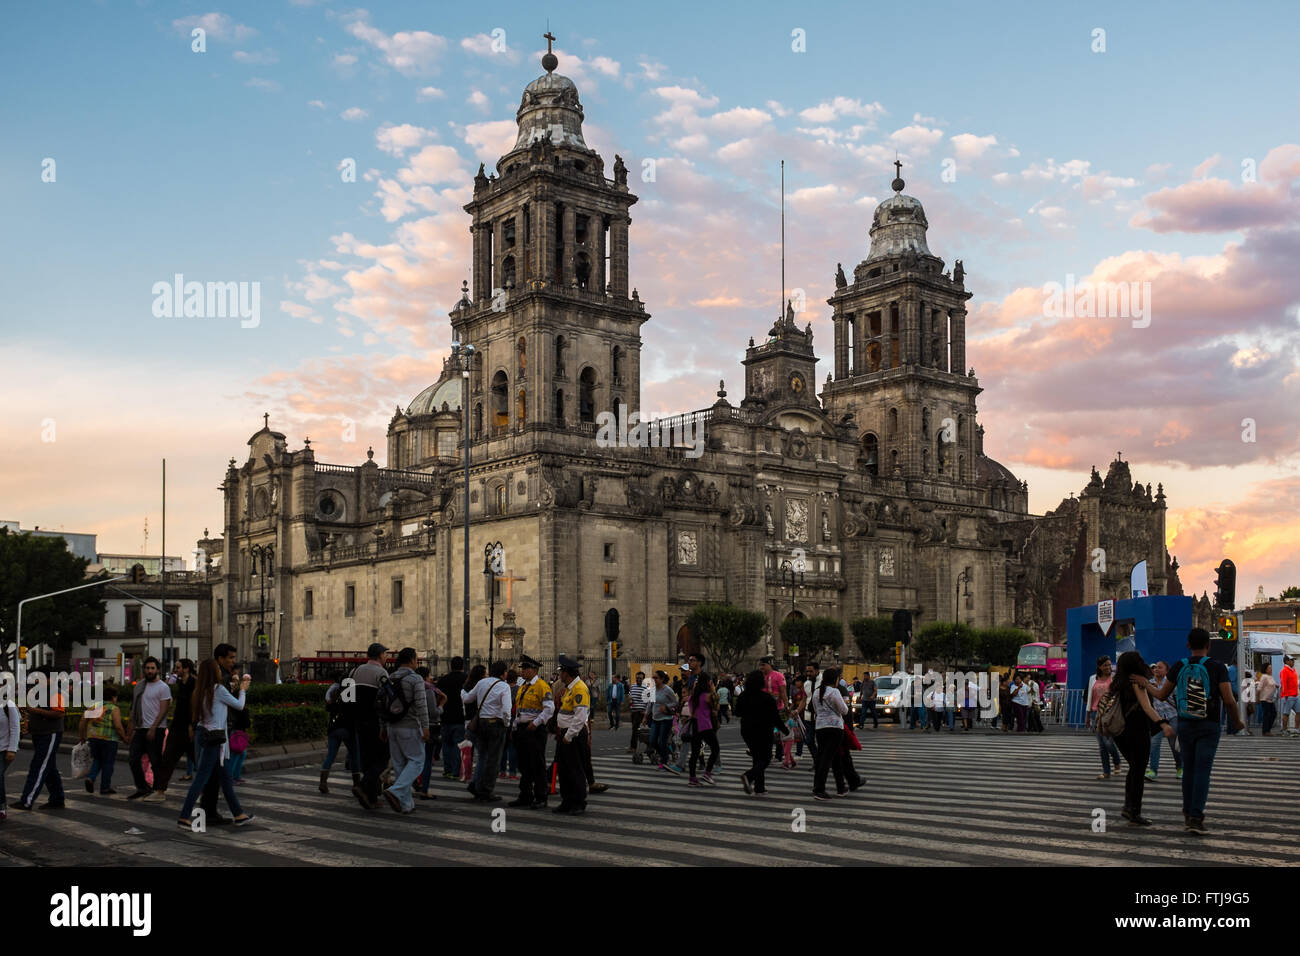 Catedral Metropolitana Mexico CIty and Zocalo - Stock Image